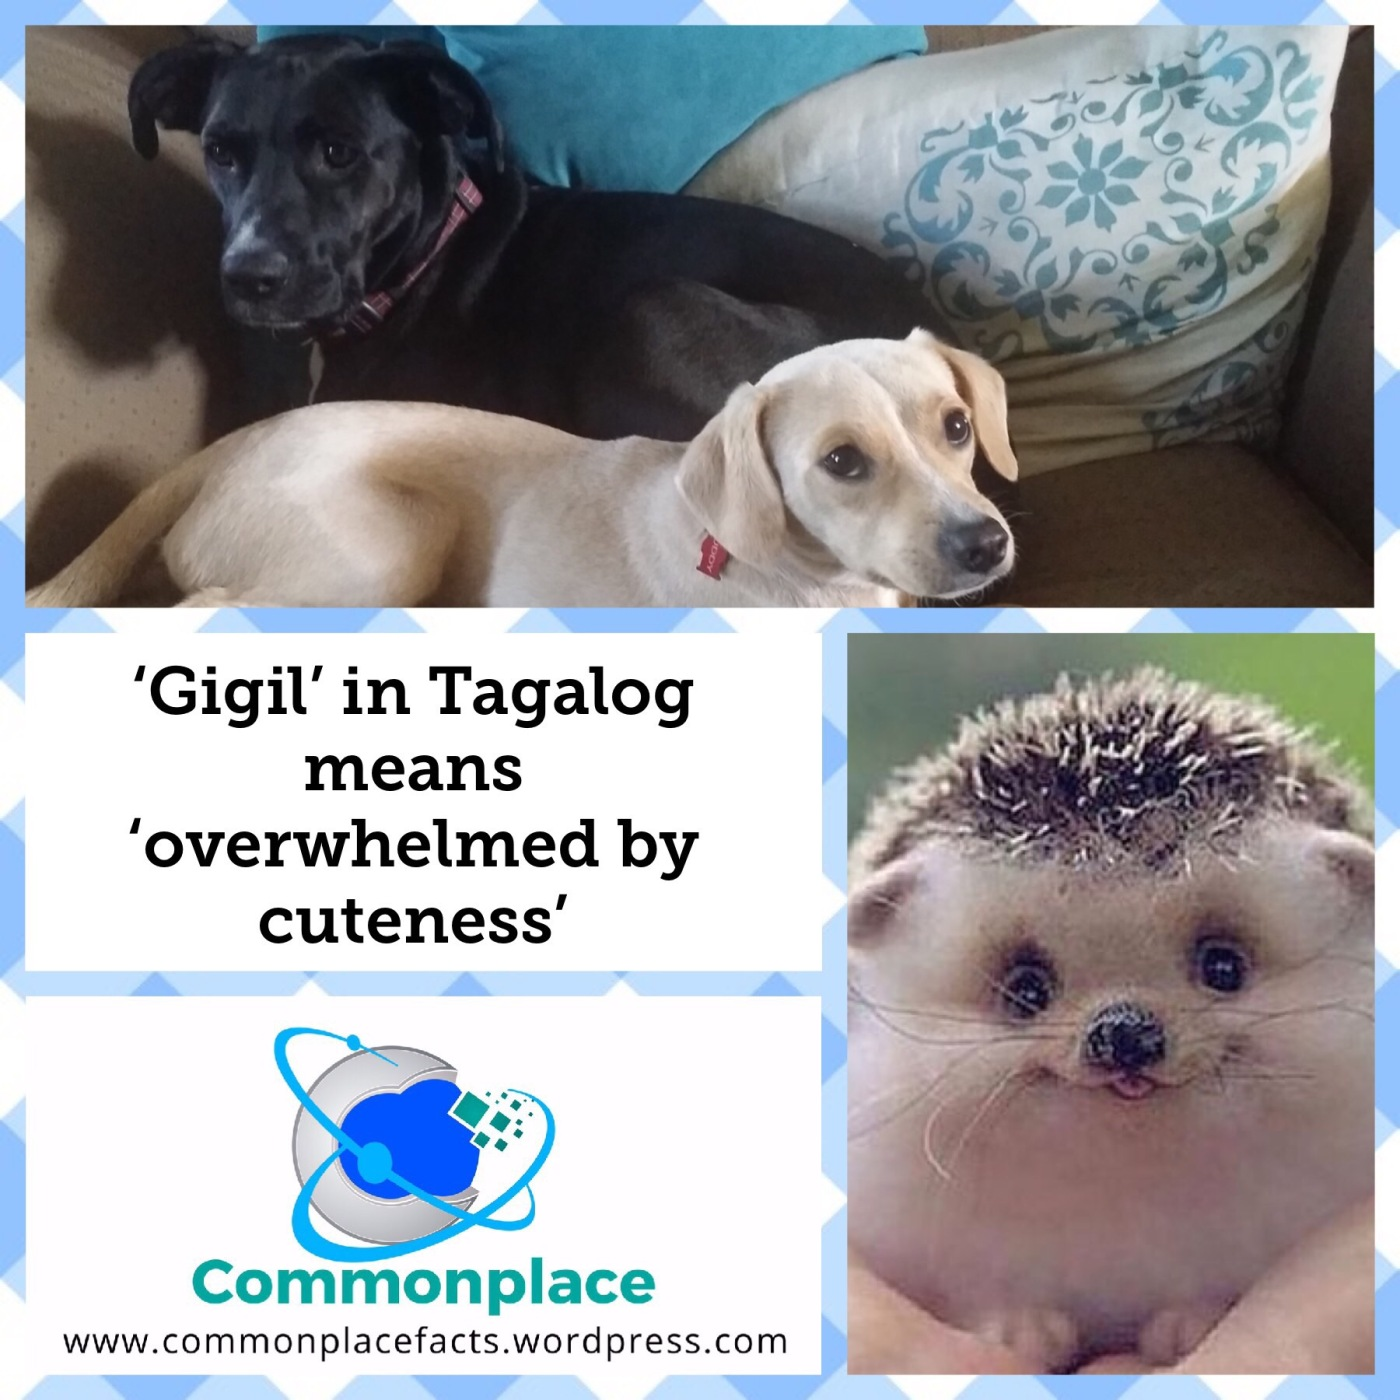 #gigil #tagalog #cuteness #cutenessoverload